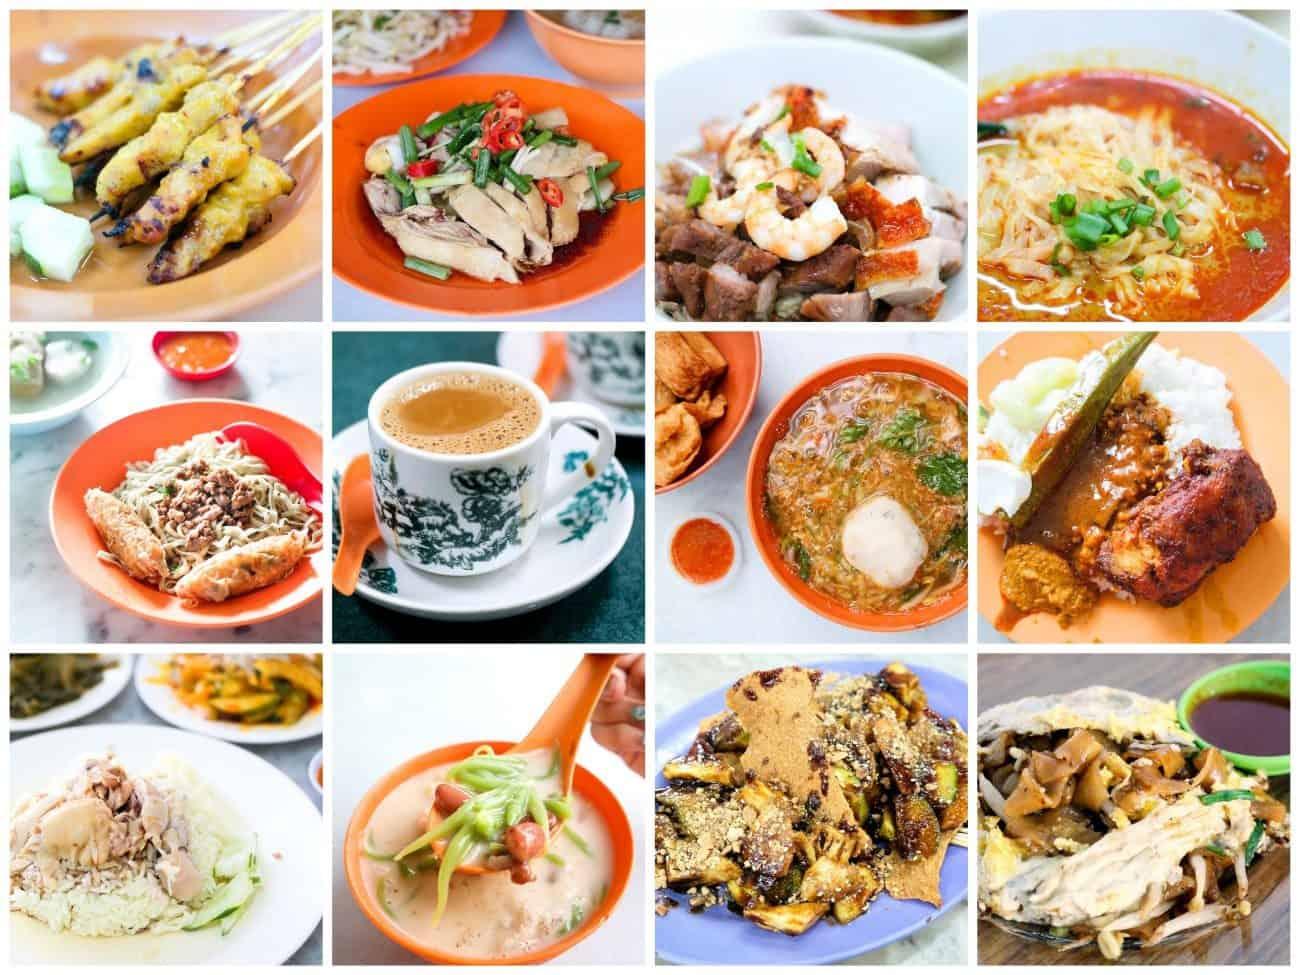 Ipoh Western Food Restaurant